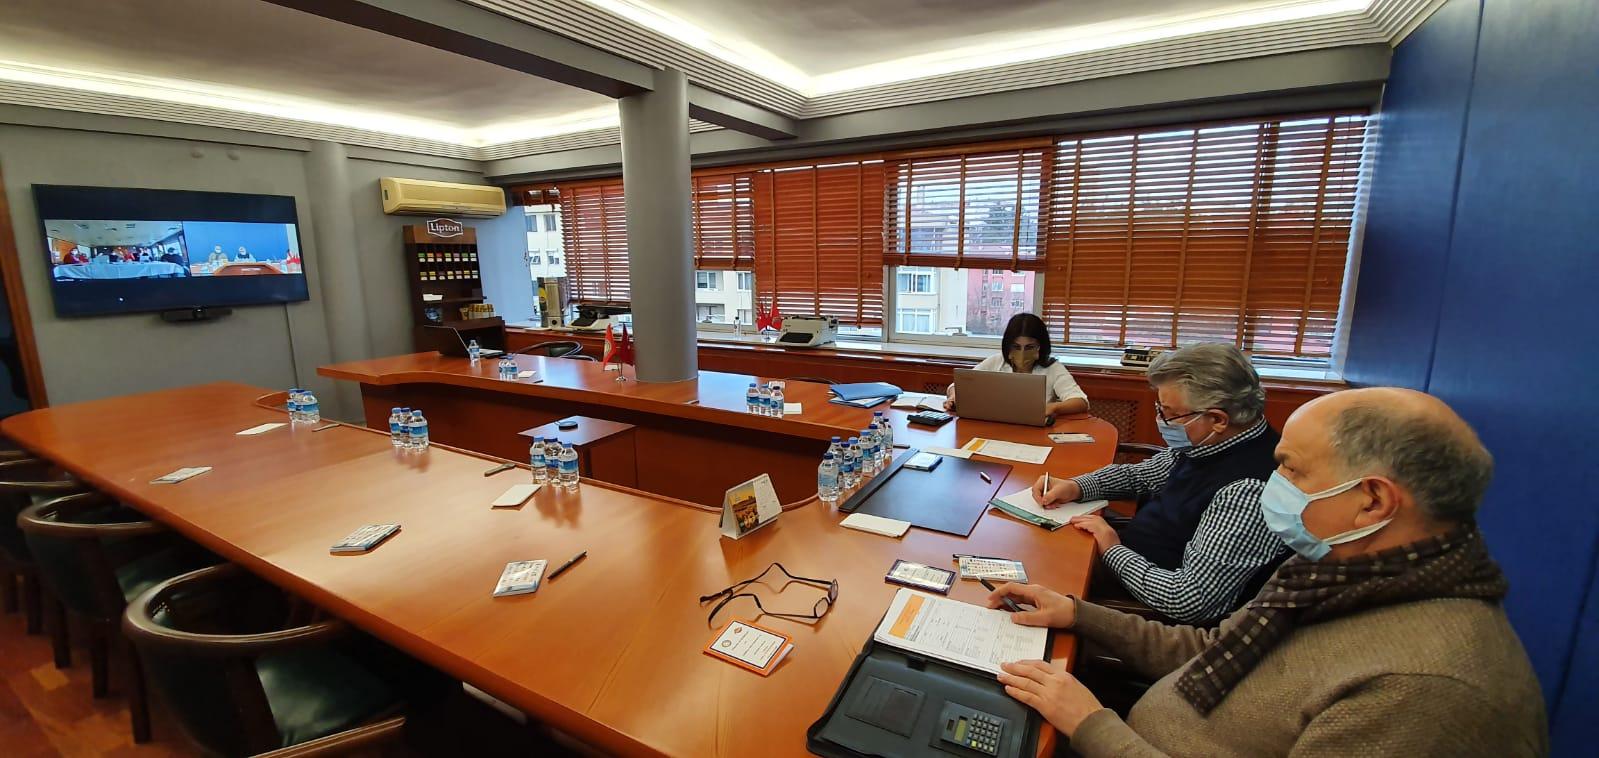 Sendikamızın örgütlü olduğu Evyap'ta Toplu İş Sözleşme süreci başladı.